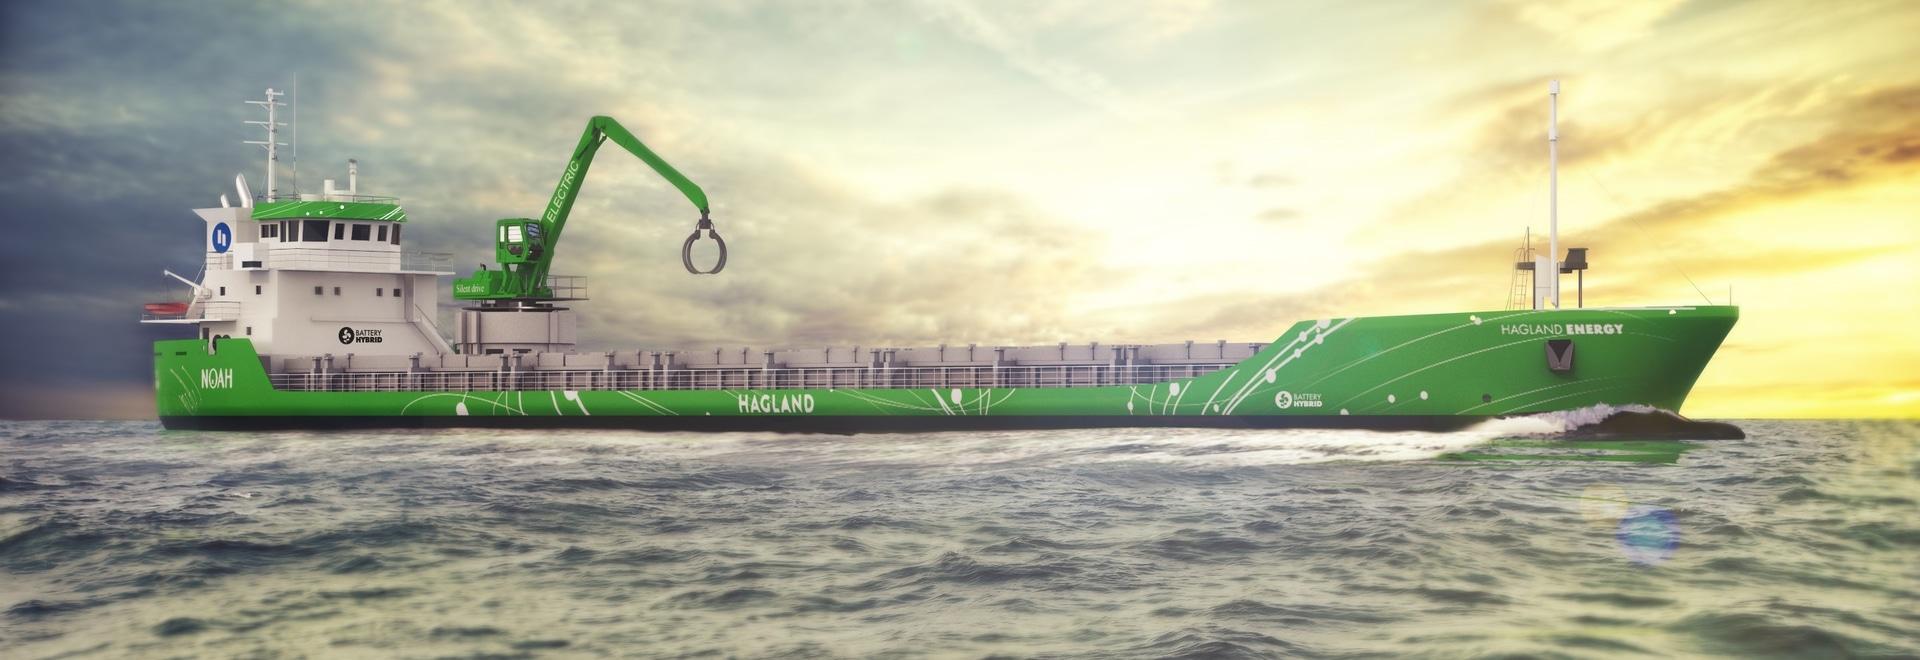 Wärtsilä Carry Out Worlds zum 1. hybriden Umbau-kurz Seeschiff